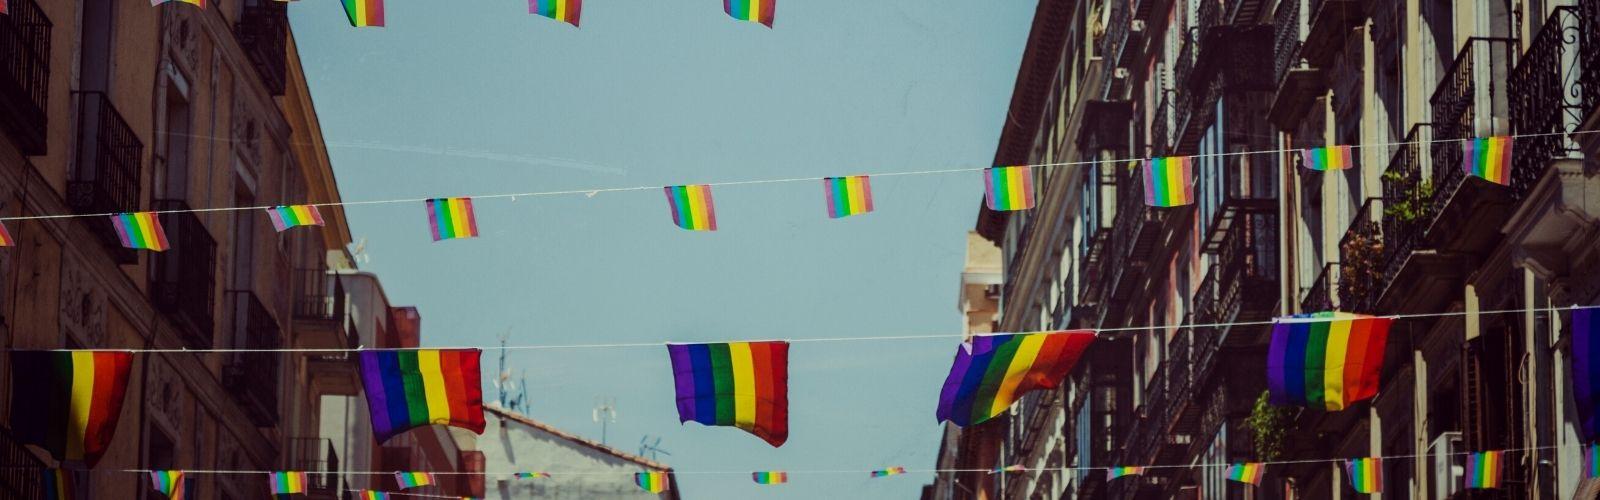 Ocupacion Hoteles Madrid Orgullo 2021